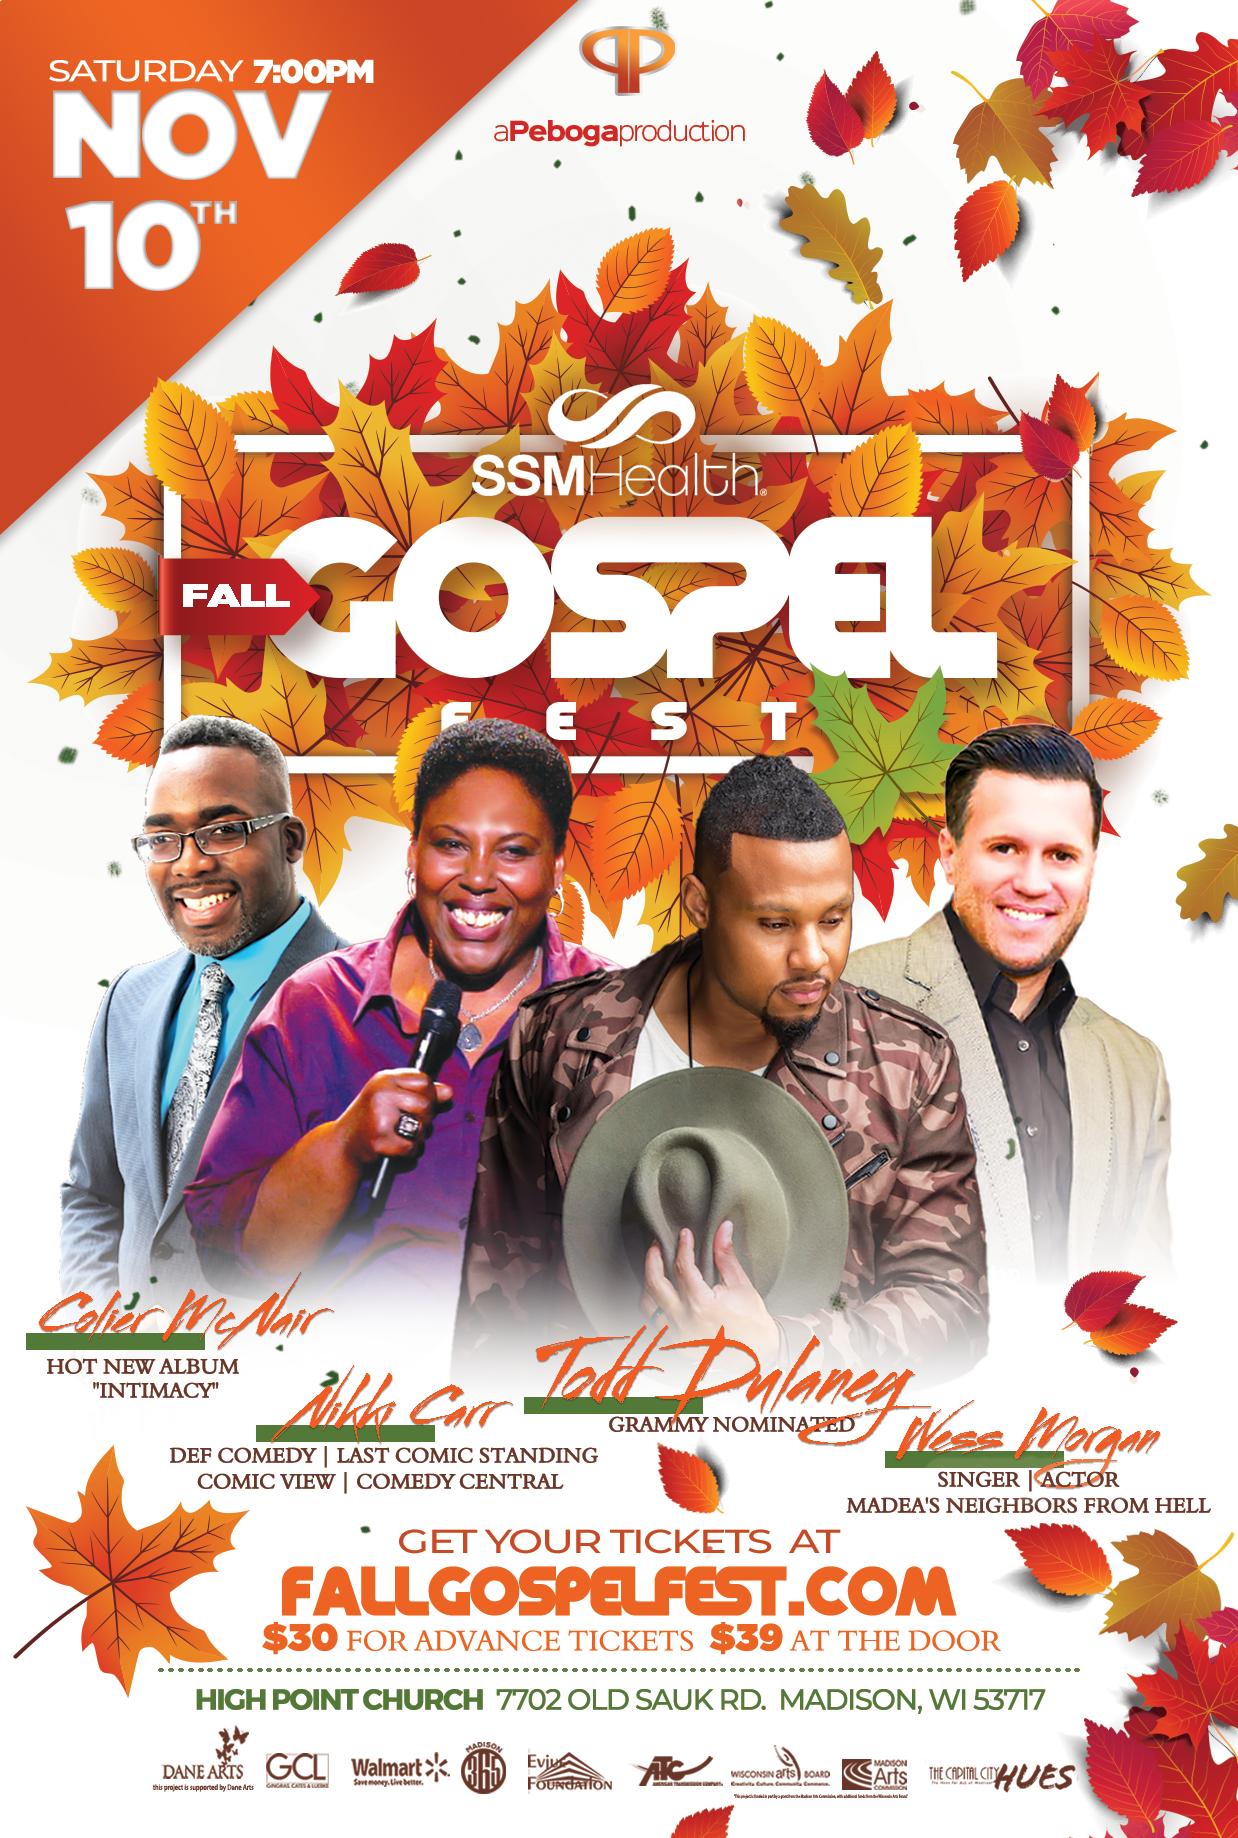 SSM Health Fall Gospel Fest